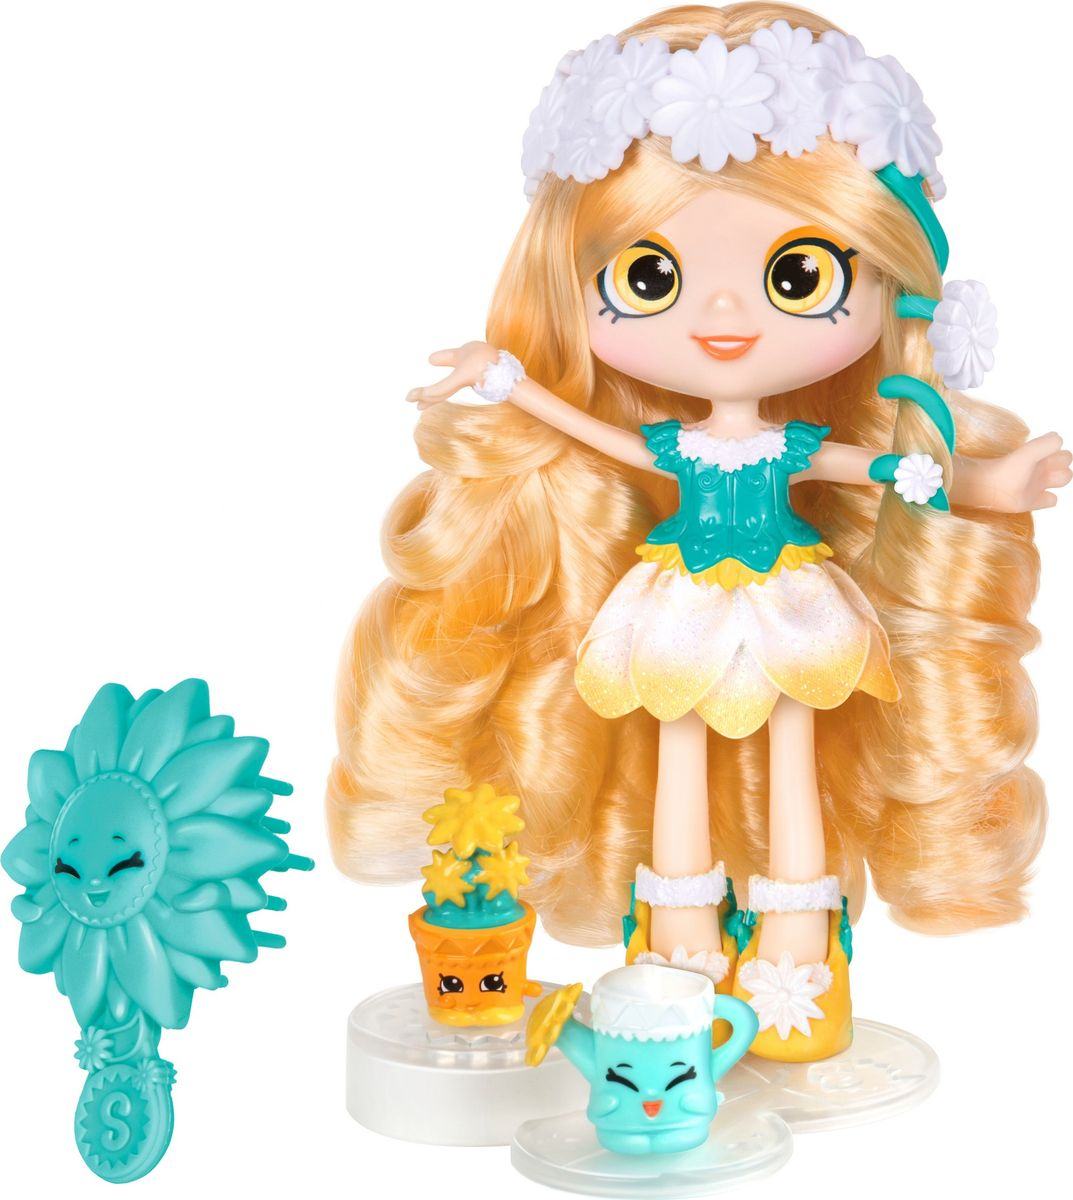 Moose Мини-кукла Цветочная Daisy Petals фигурки игрушки moose кукла шоппиес джессикейк